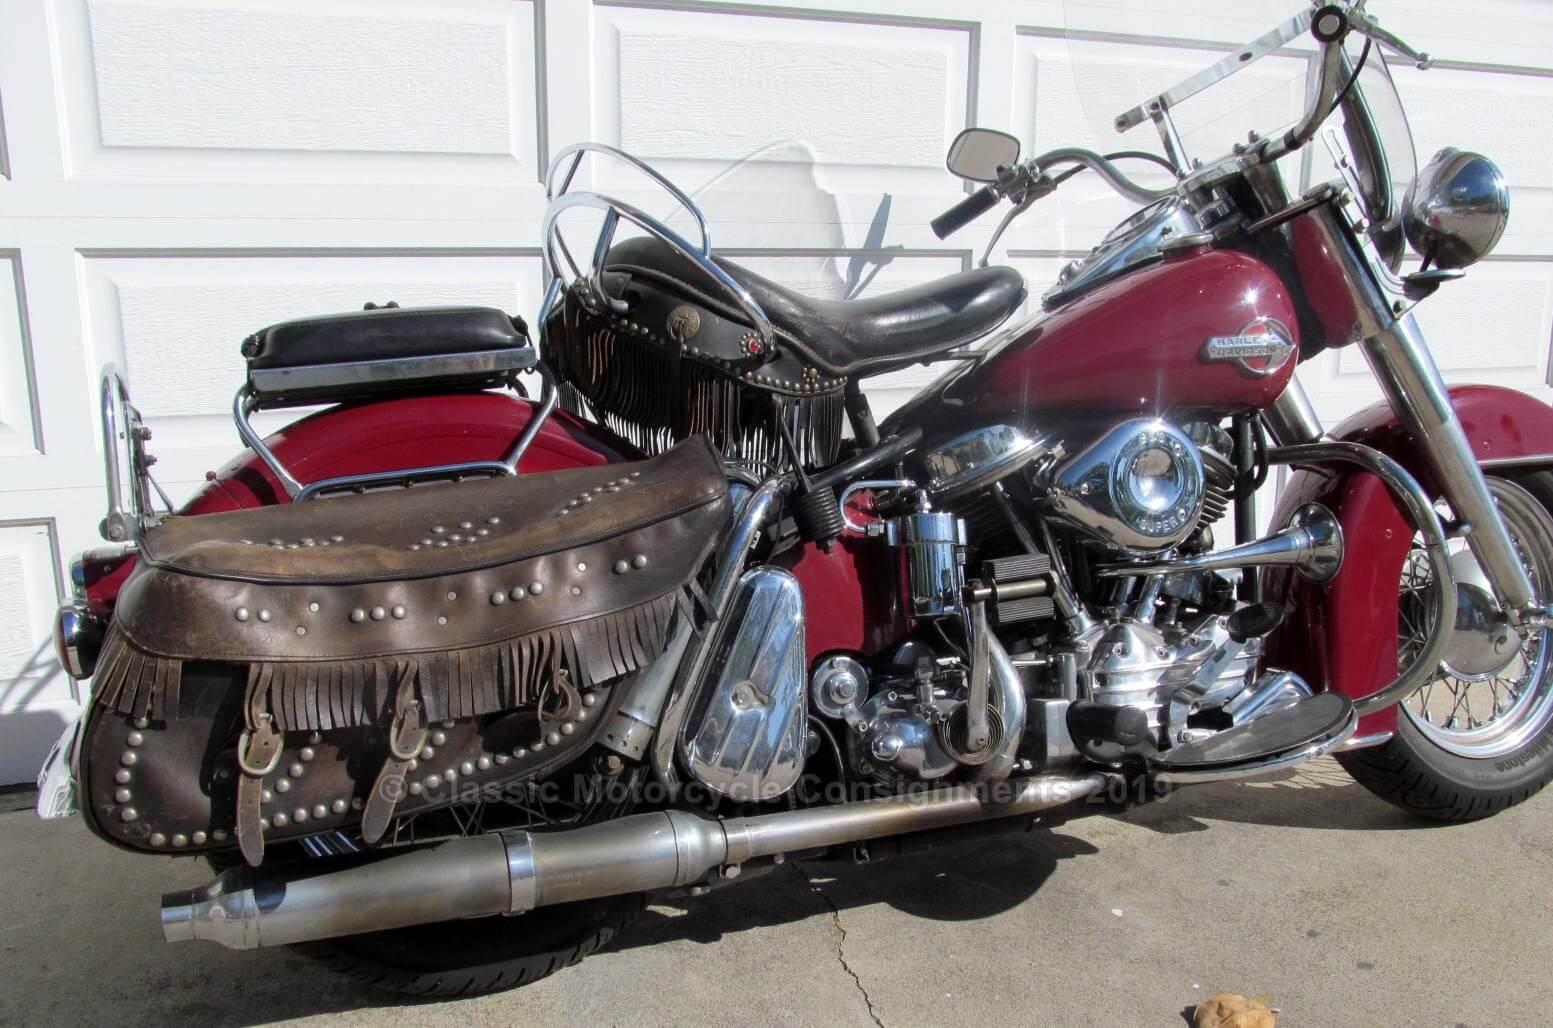 1959 Harley Davidson FLH Custom 98-Inch 4-Speed Electric Start — SOLD